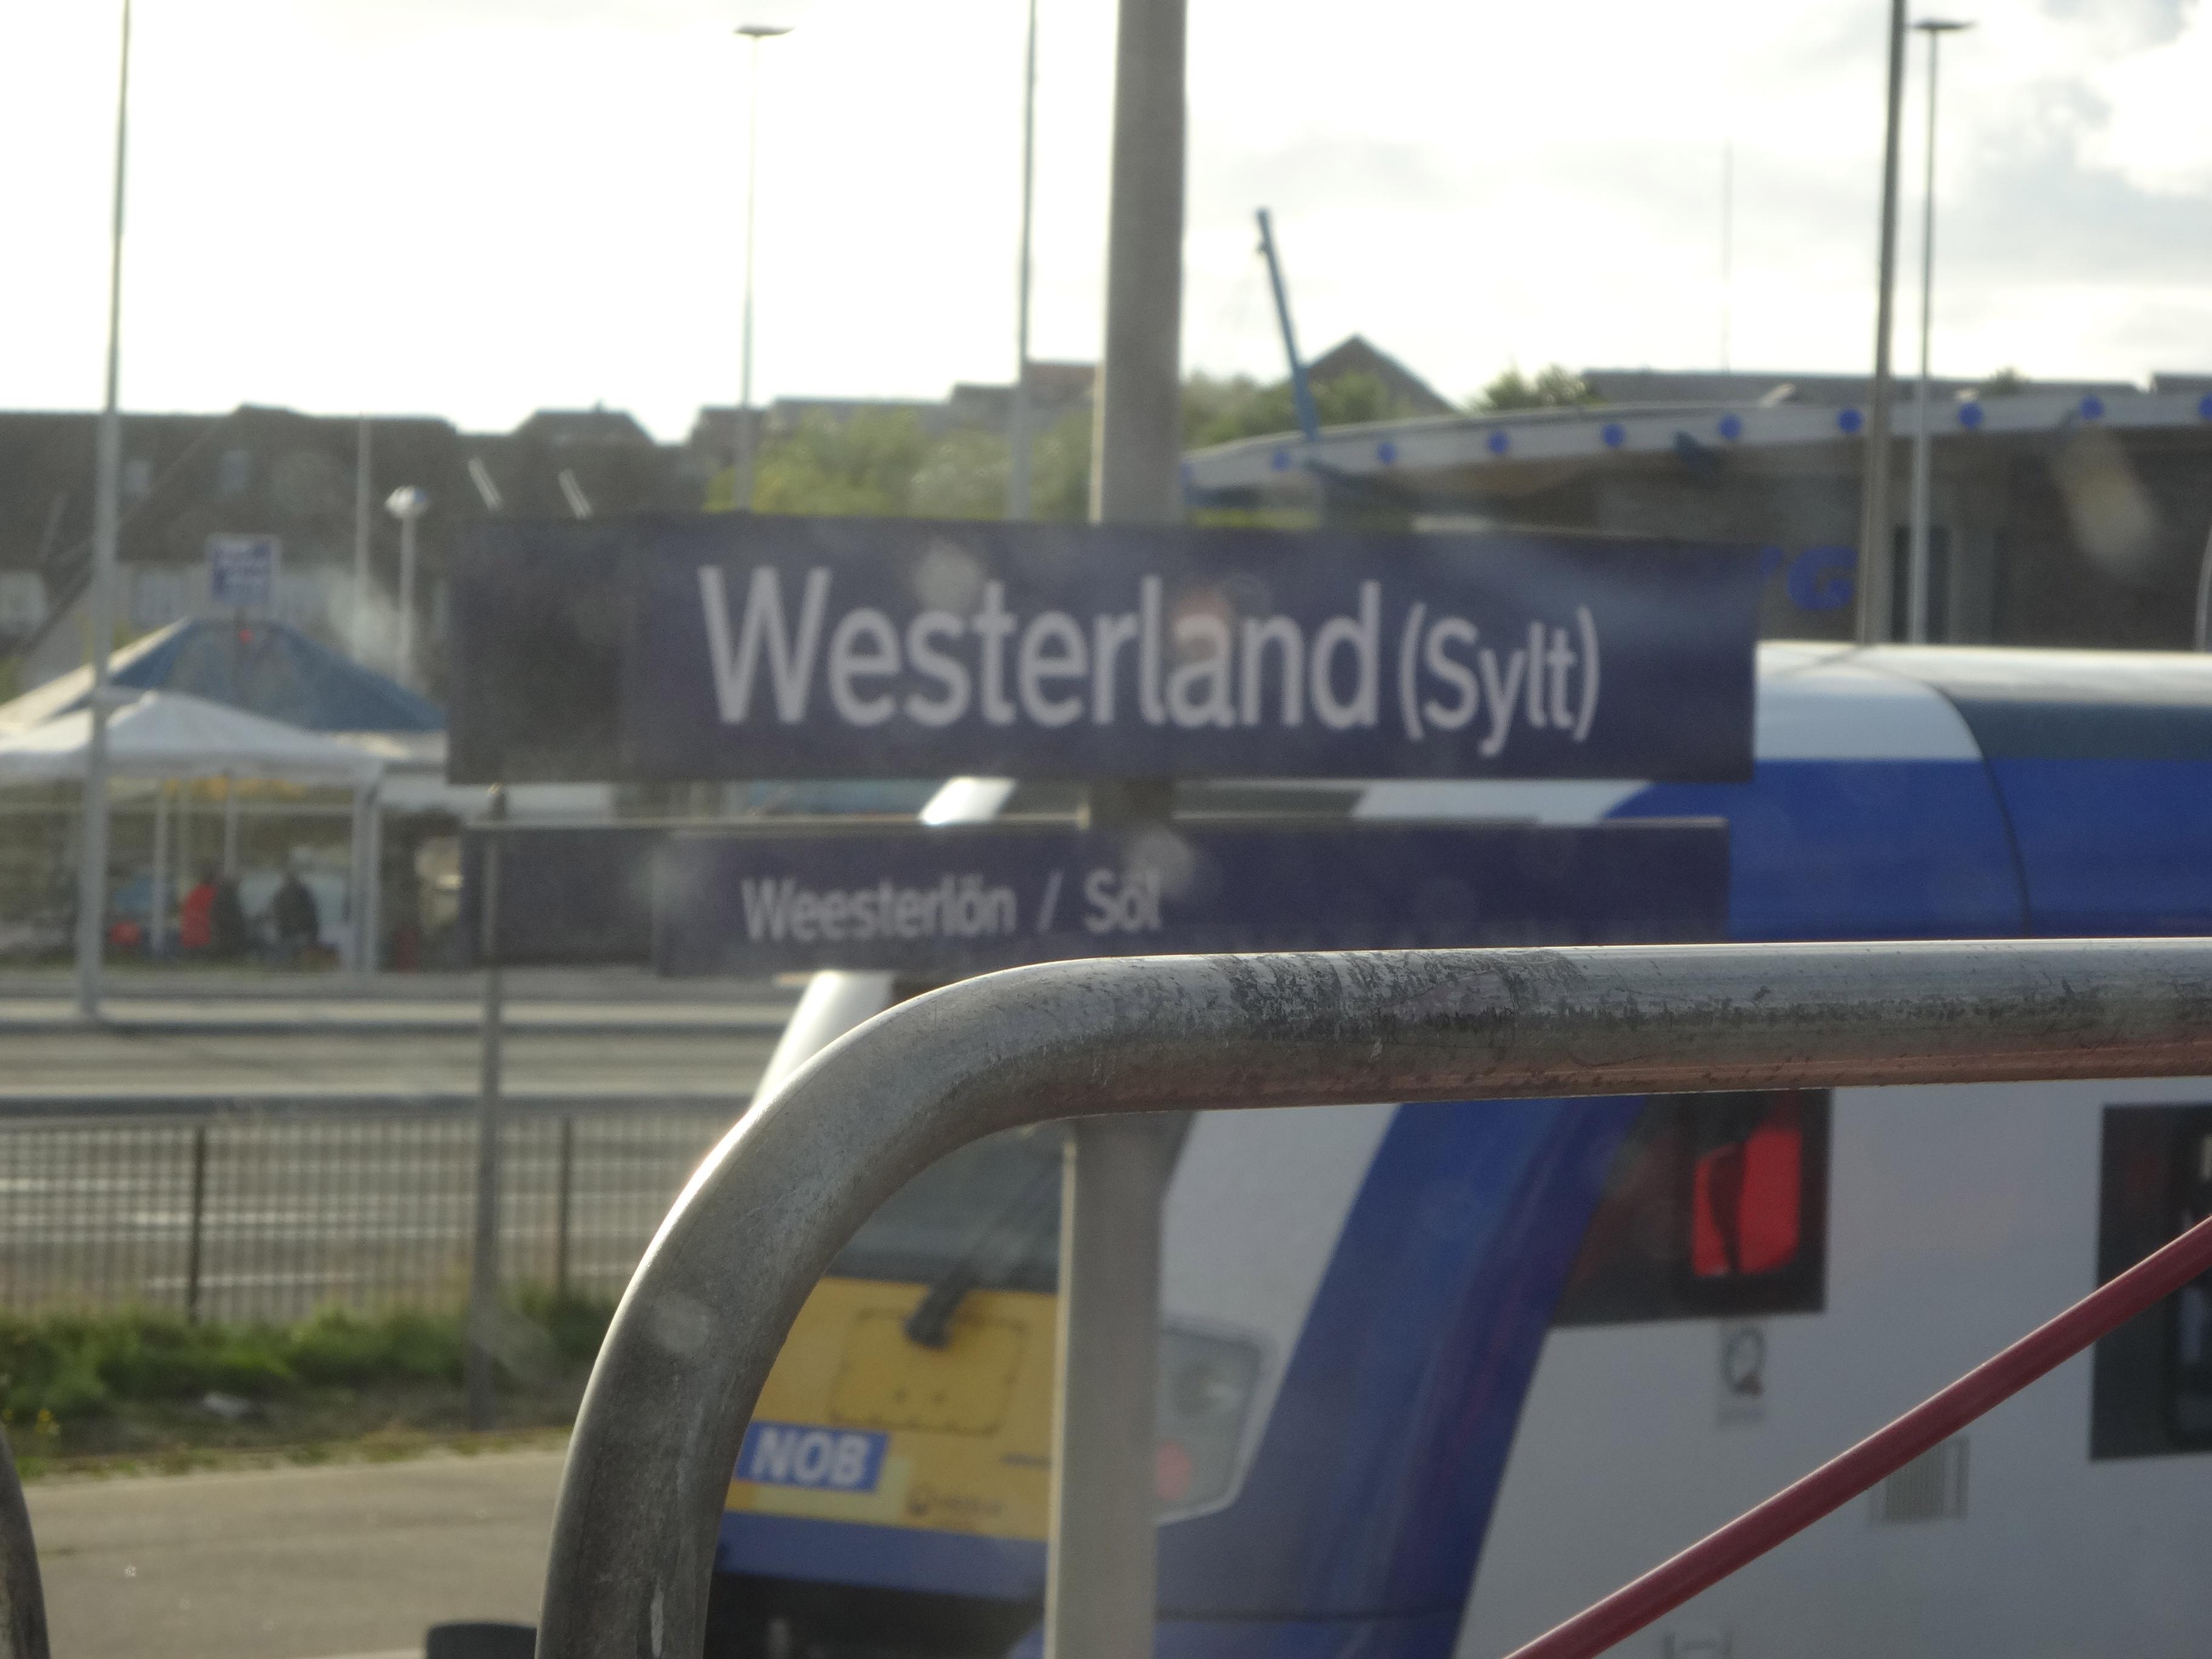 Ankunft / arrival in Westerland